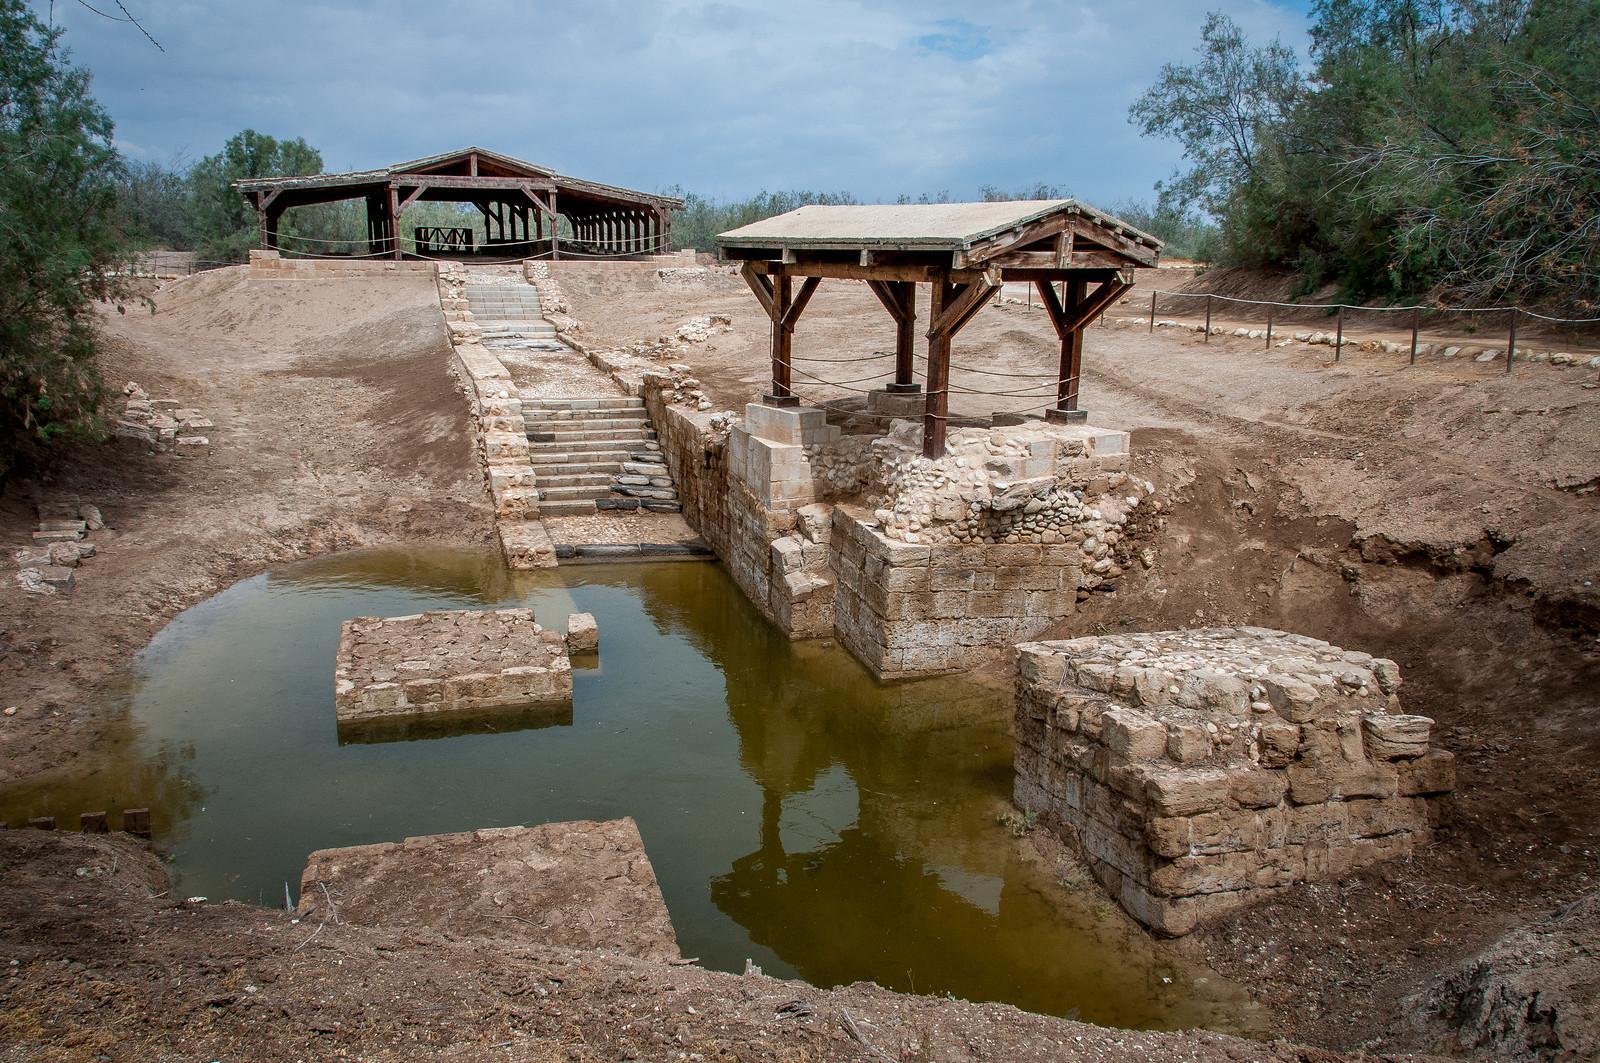 10:30 - 12:00 The baptism site of Jesus Christ